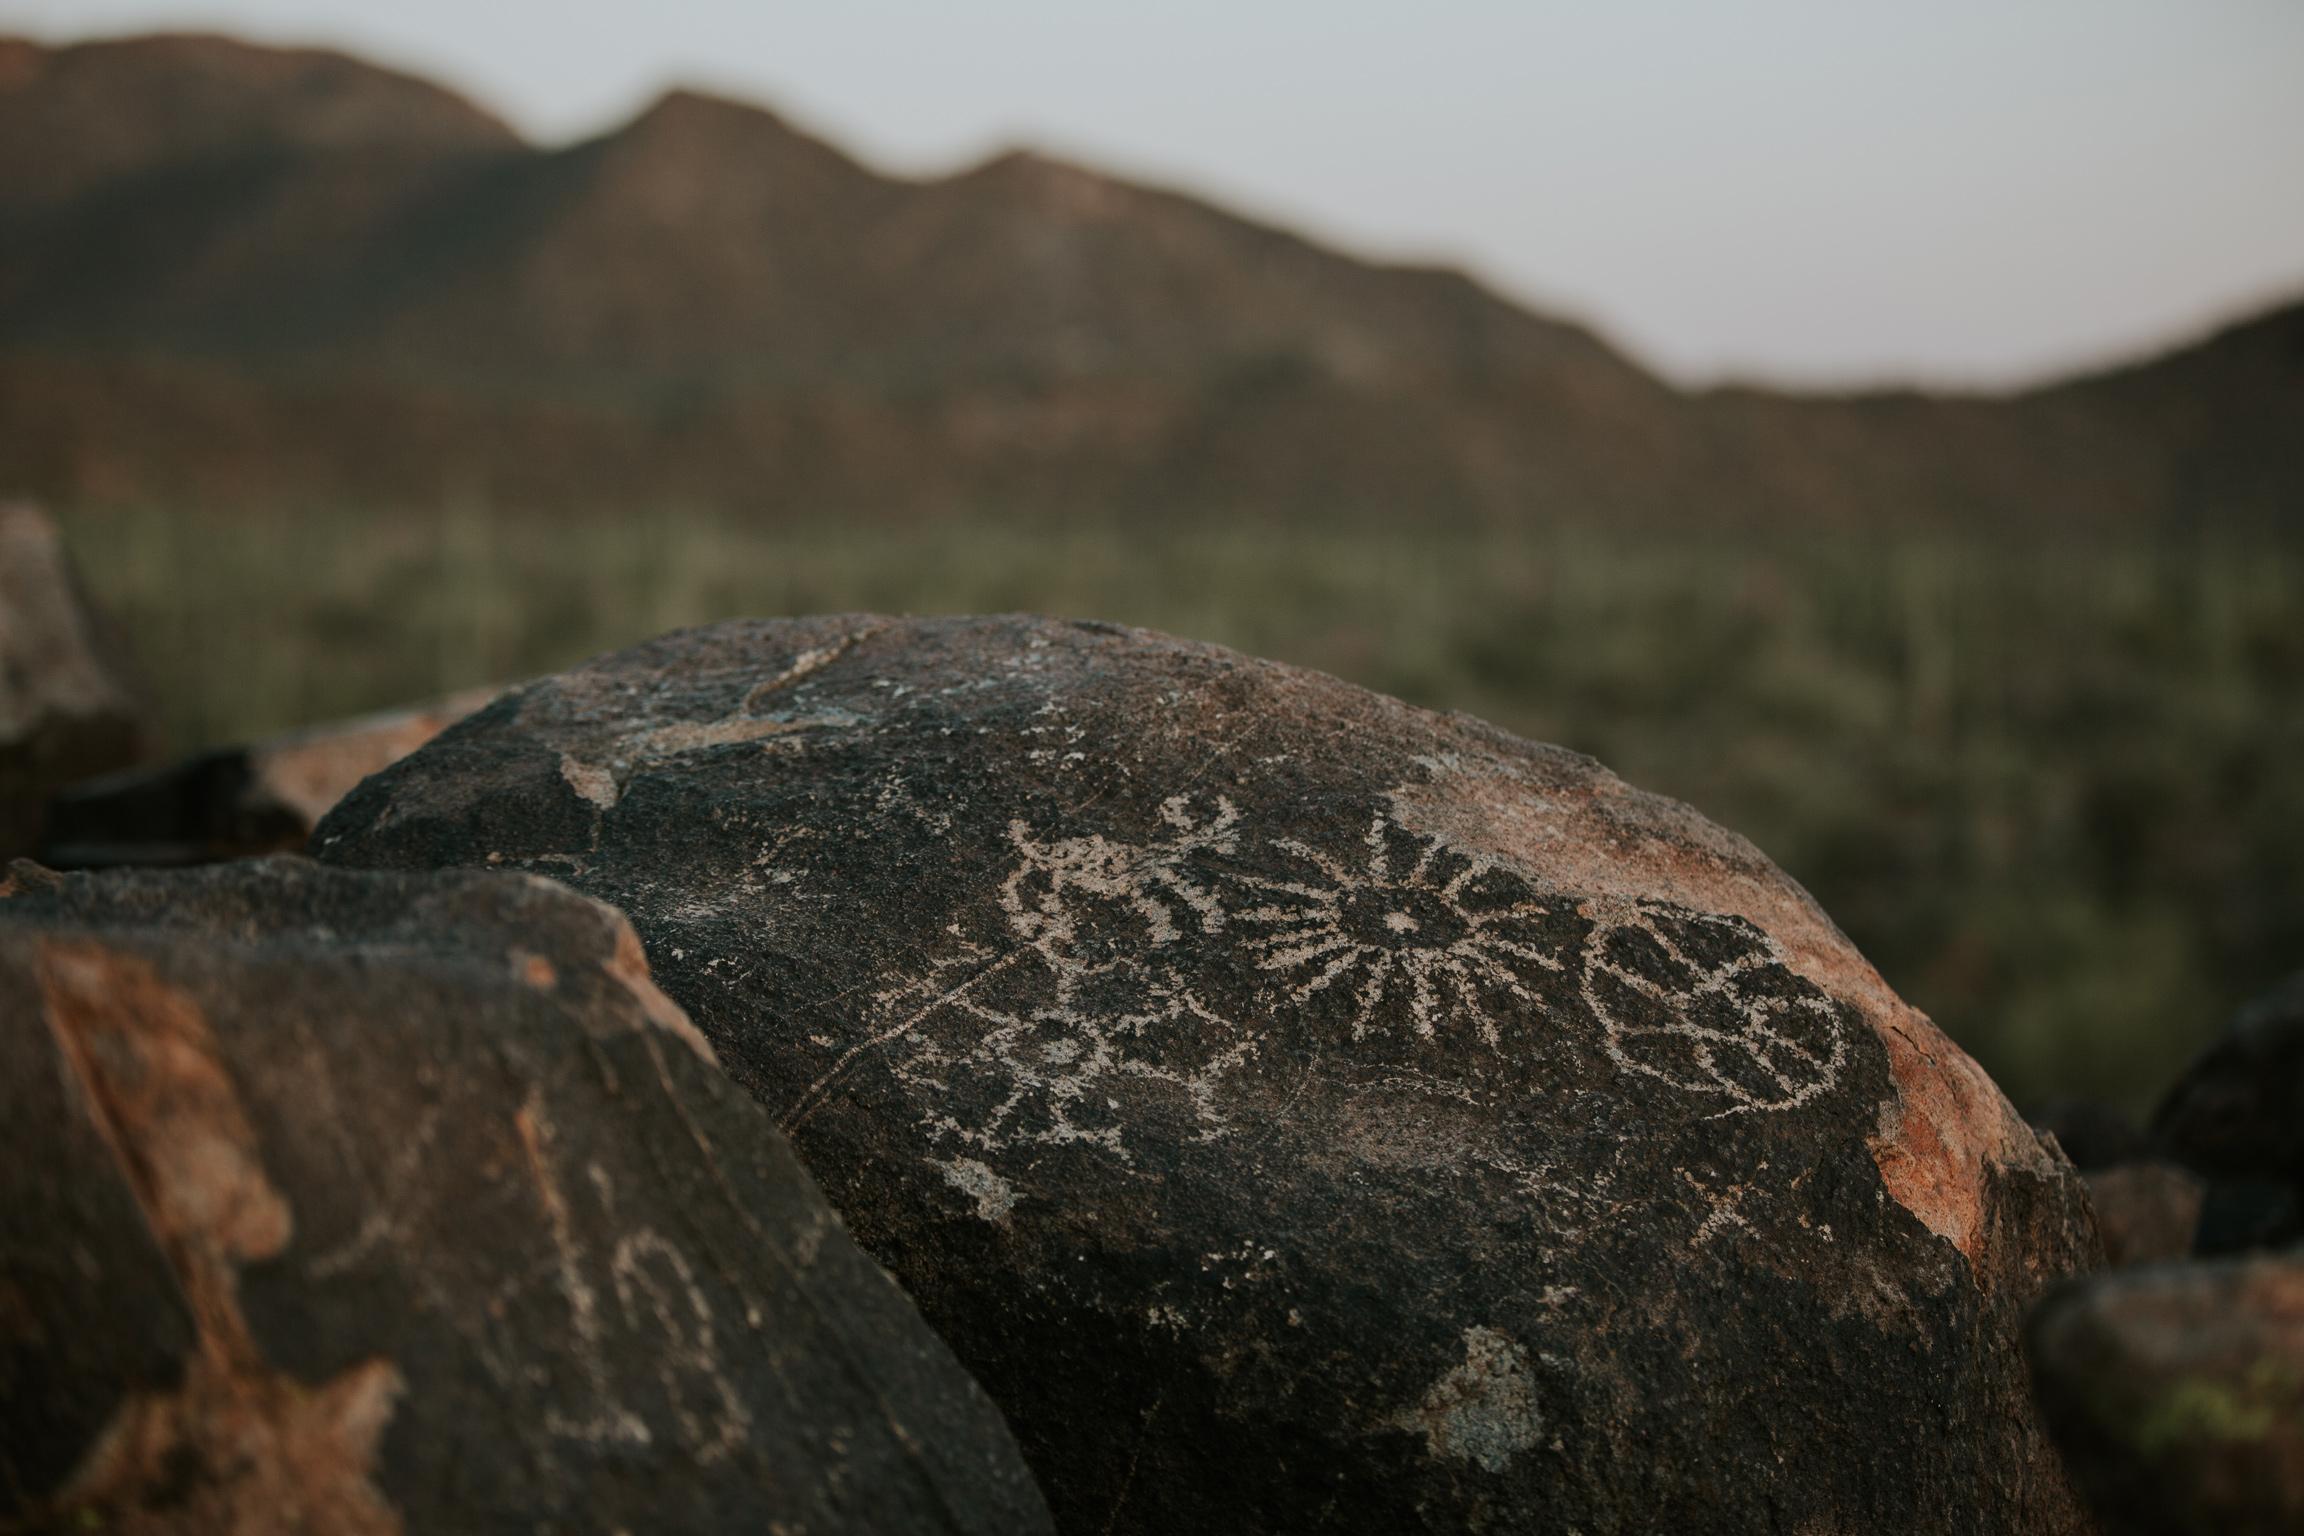 CindyGiovagnoli_Tucson_Arizona_Saguaro_National_Park_cactus_sunset_blooming_spring_sunset_petroglyphs_Native_American_indigenous-024.jpg